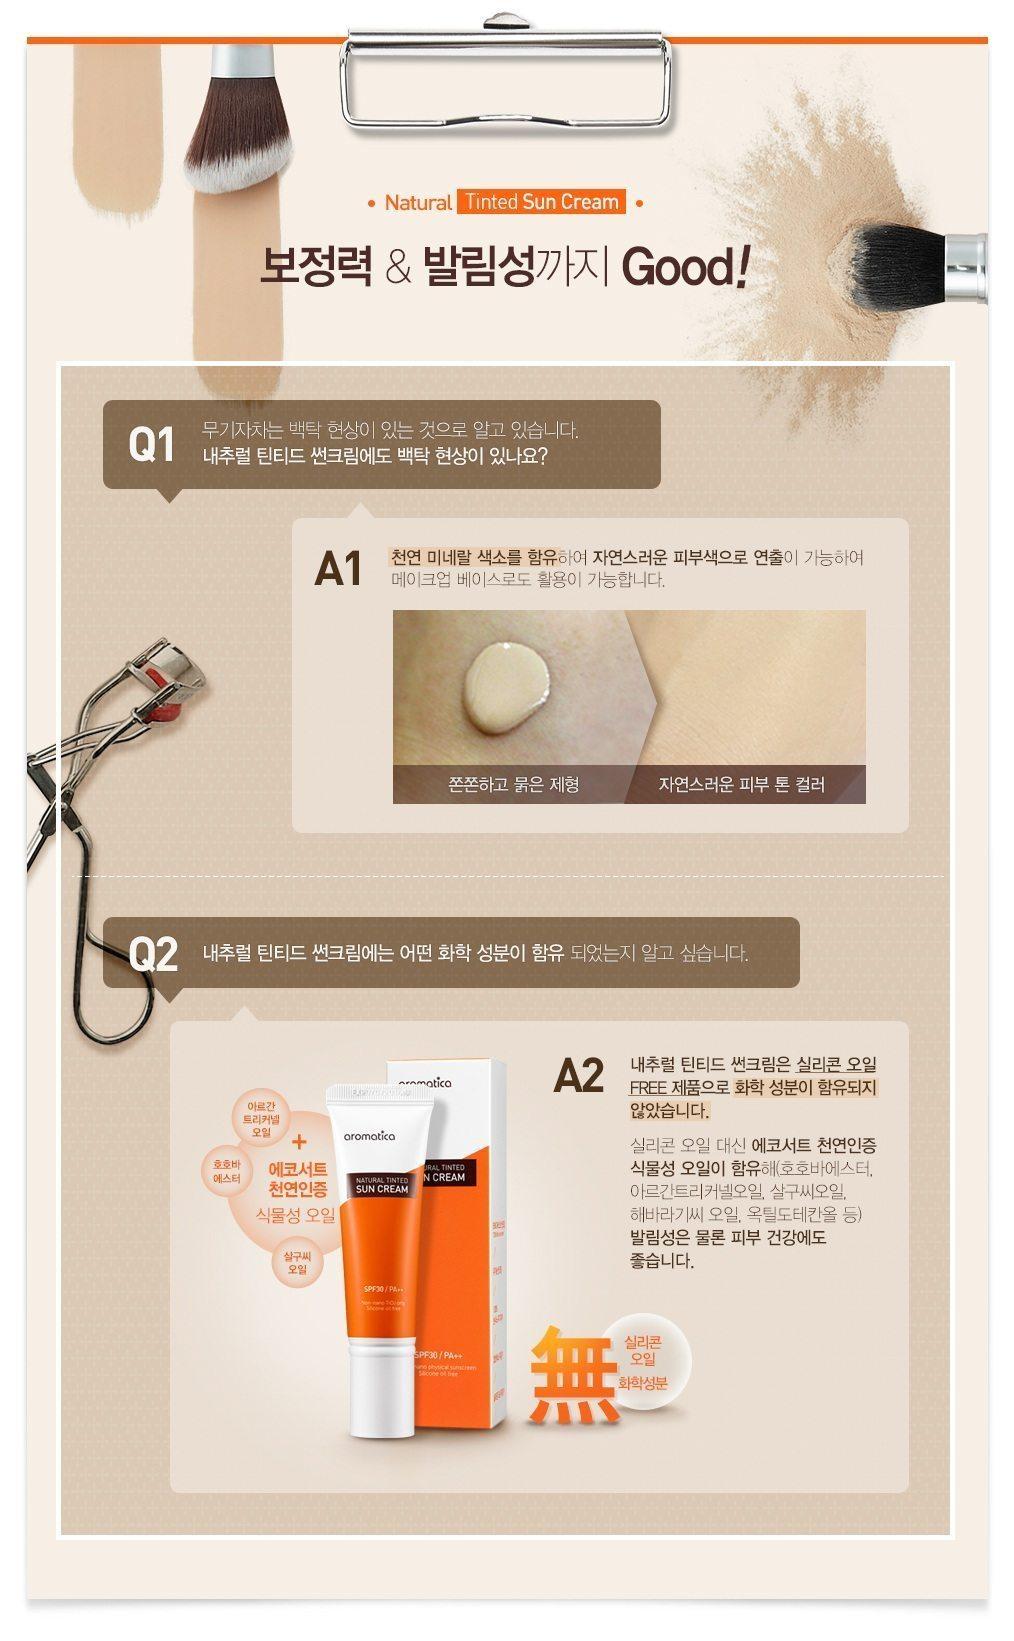 Aromatica Natural Tinted Sun Cream korean cosmetic skincare product online shop malaysia china japan4